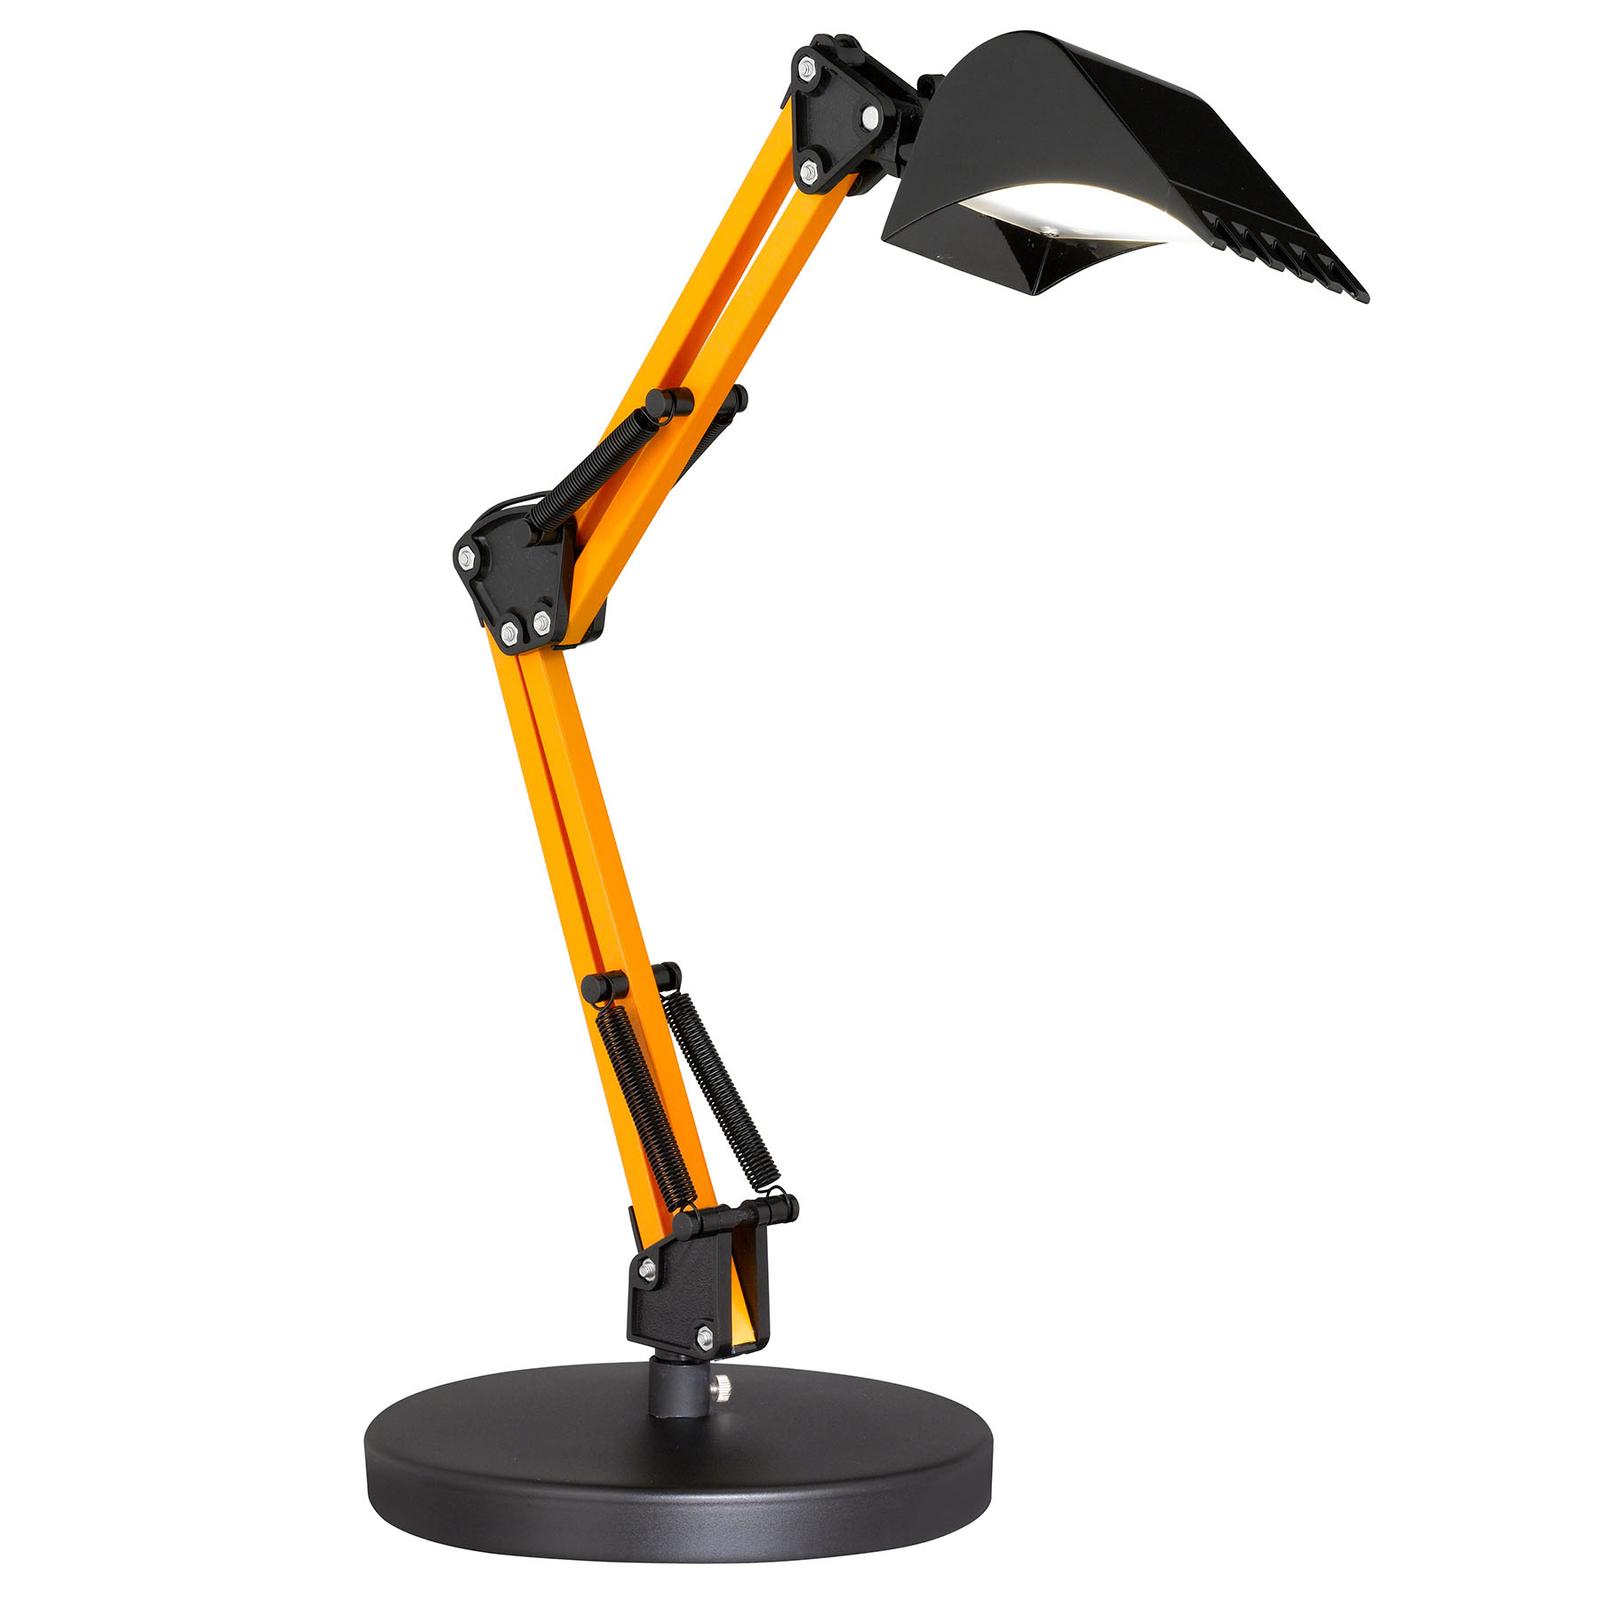 LED-Tischleuchte Scoop als Baggerschaufel